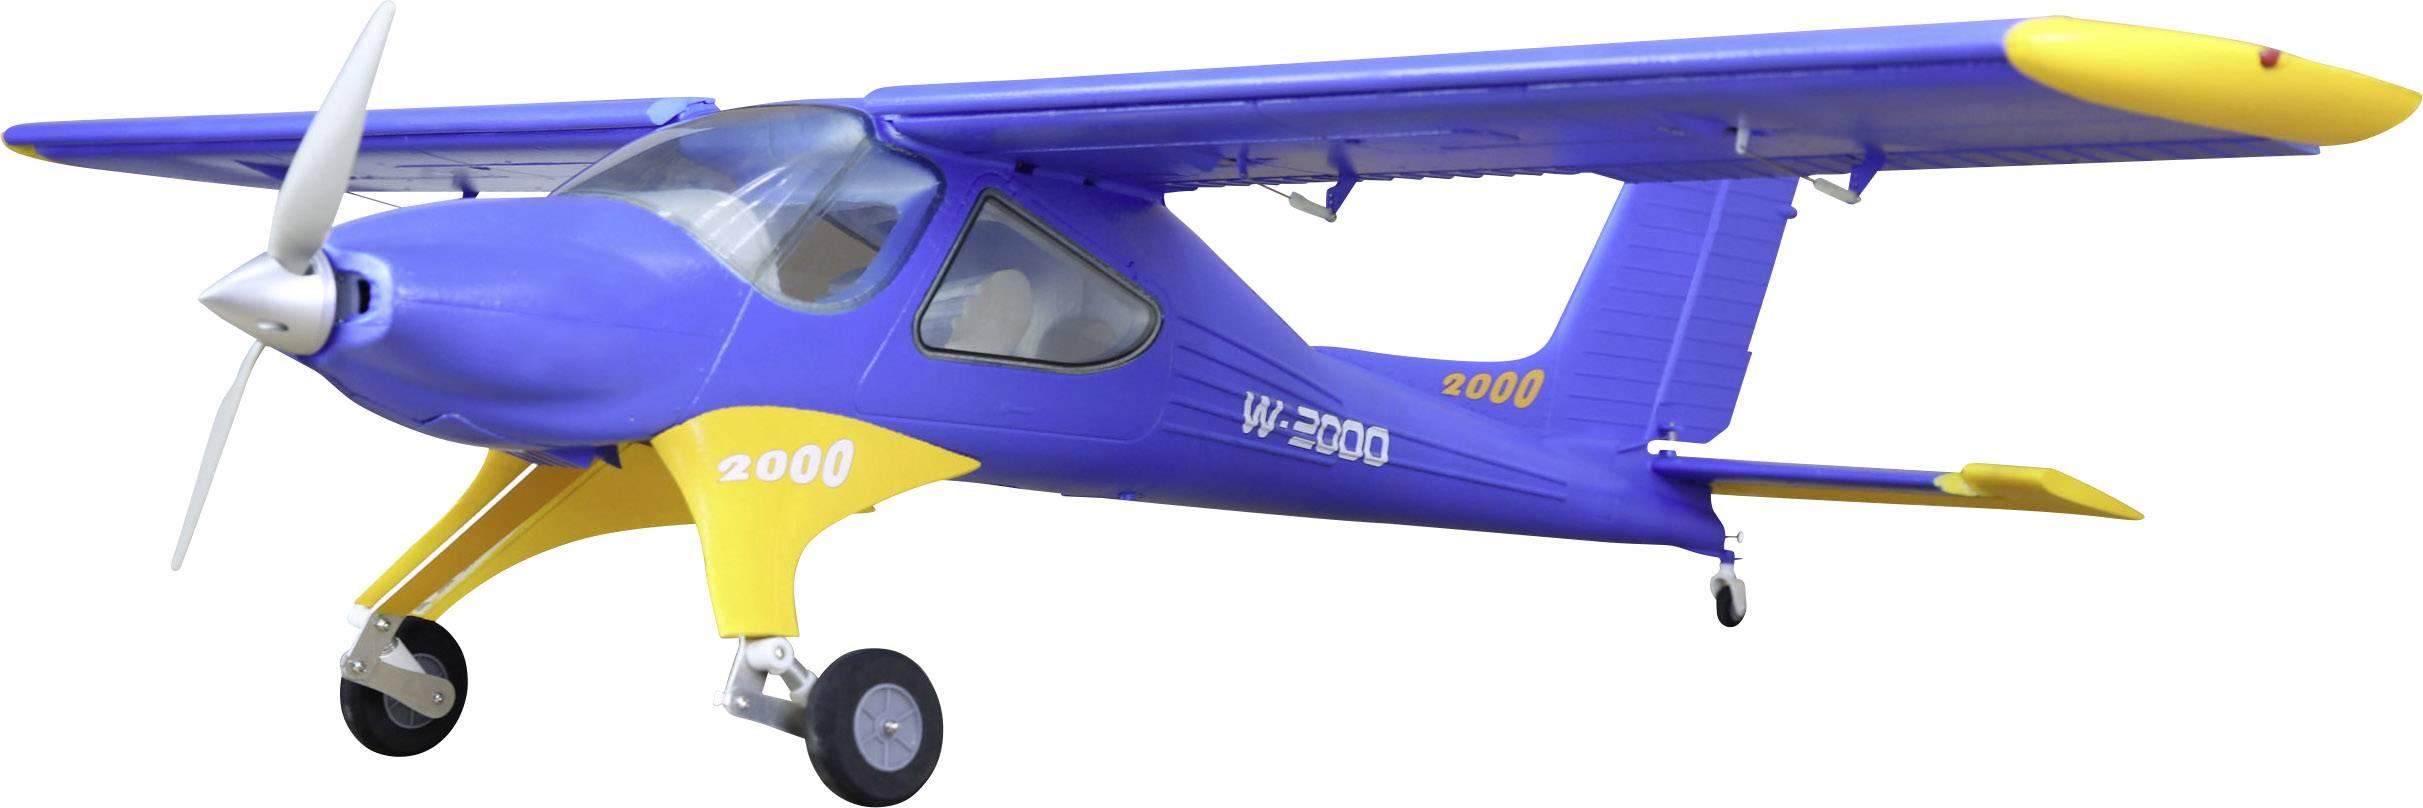 RC model motorového lietadla Reely W-2000 3009, ARF, rozpätie 1330 mm